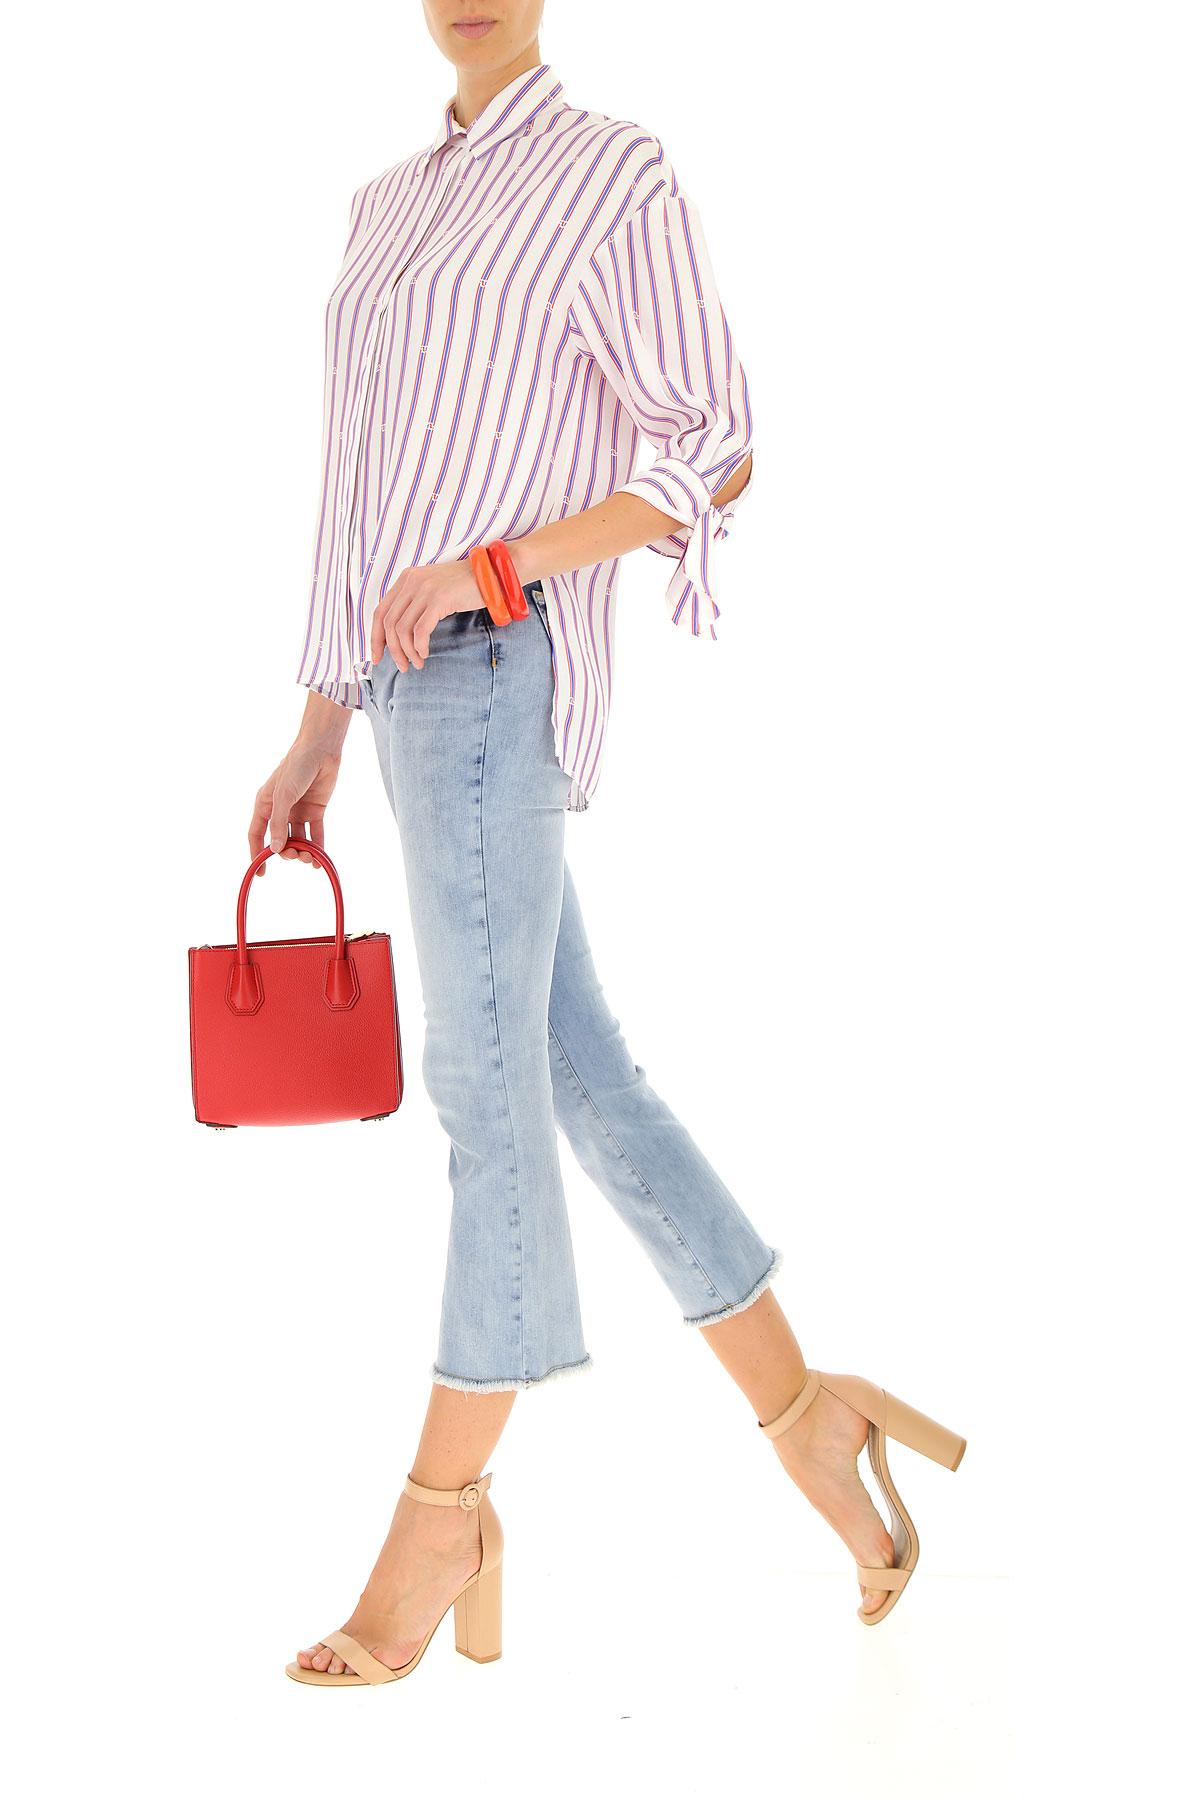 Primavera verano Rojo Blanco Mujer 2019 Ropa Para nbsp;marina Pinko qxIwtB4fpB